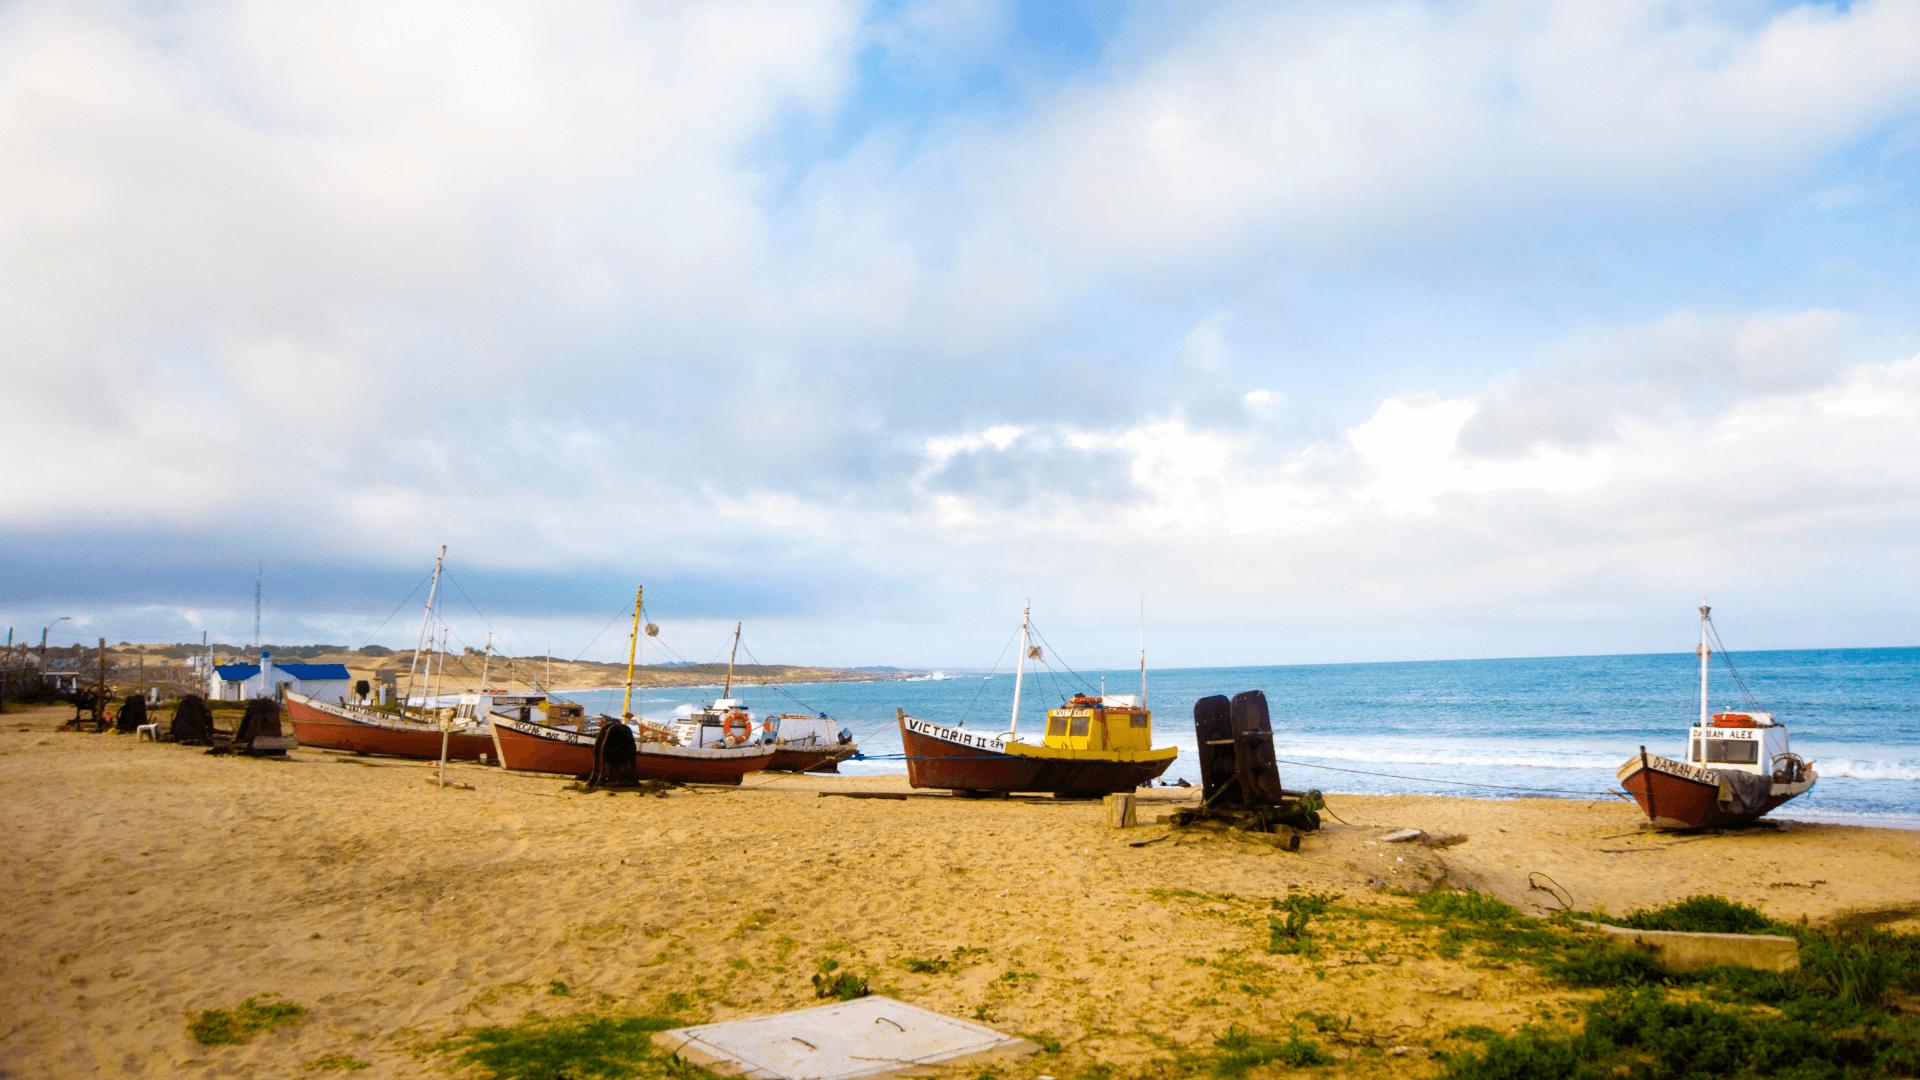 Uruguay'da Sonsuzluk Hissi, Punta Del Diablo